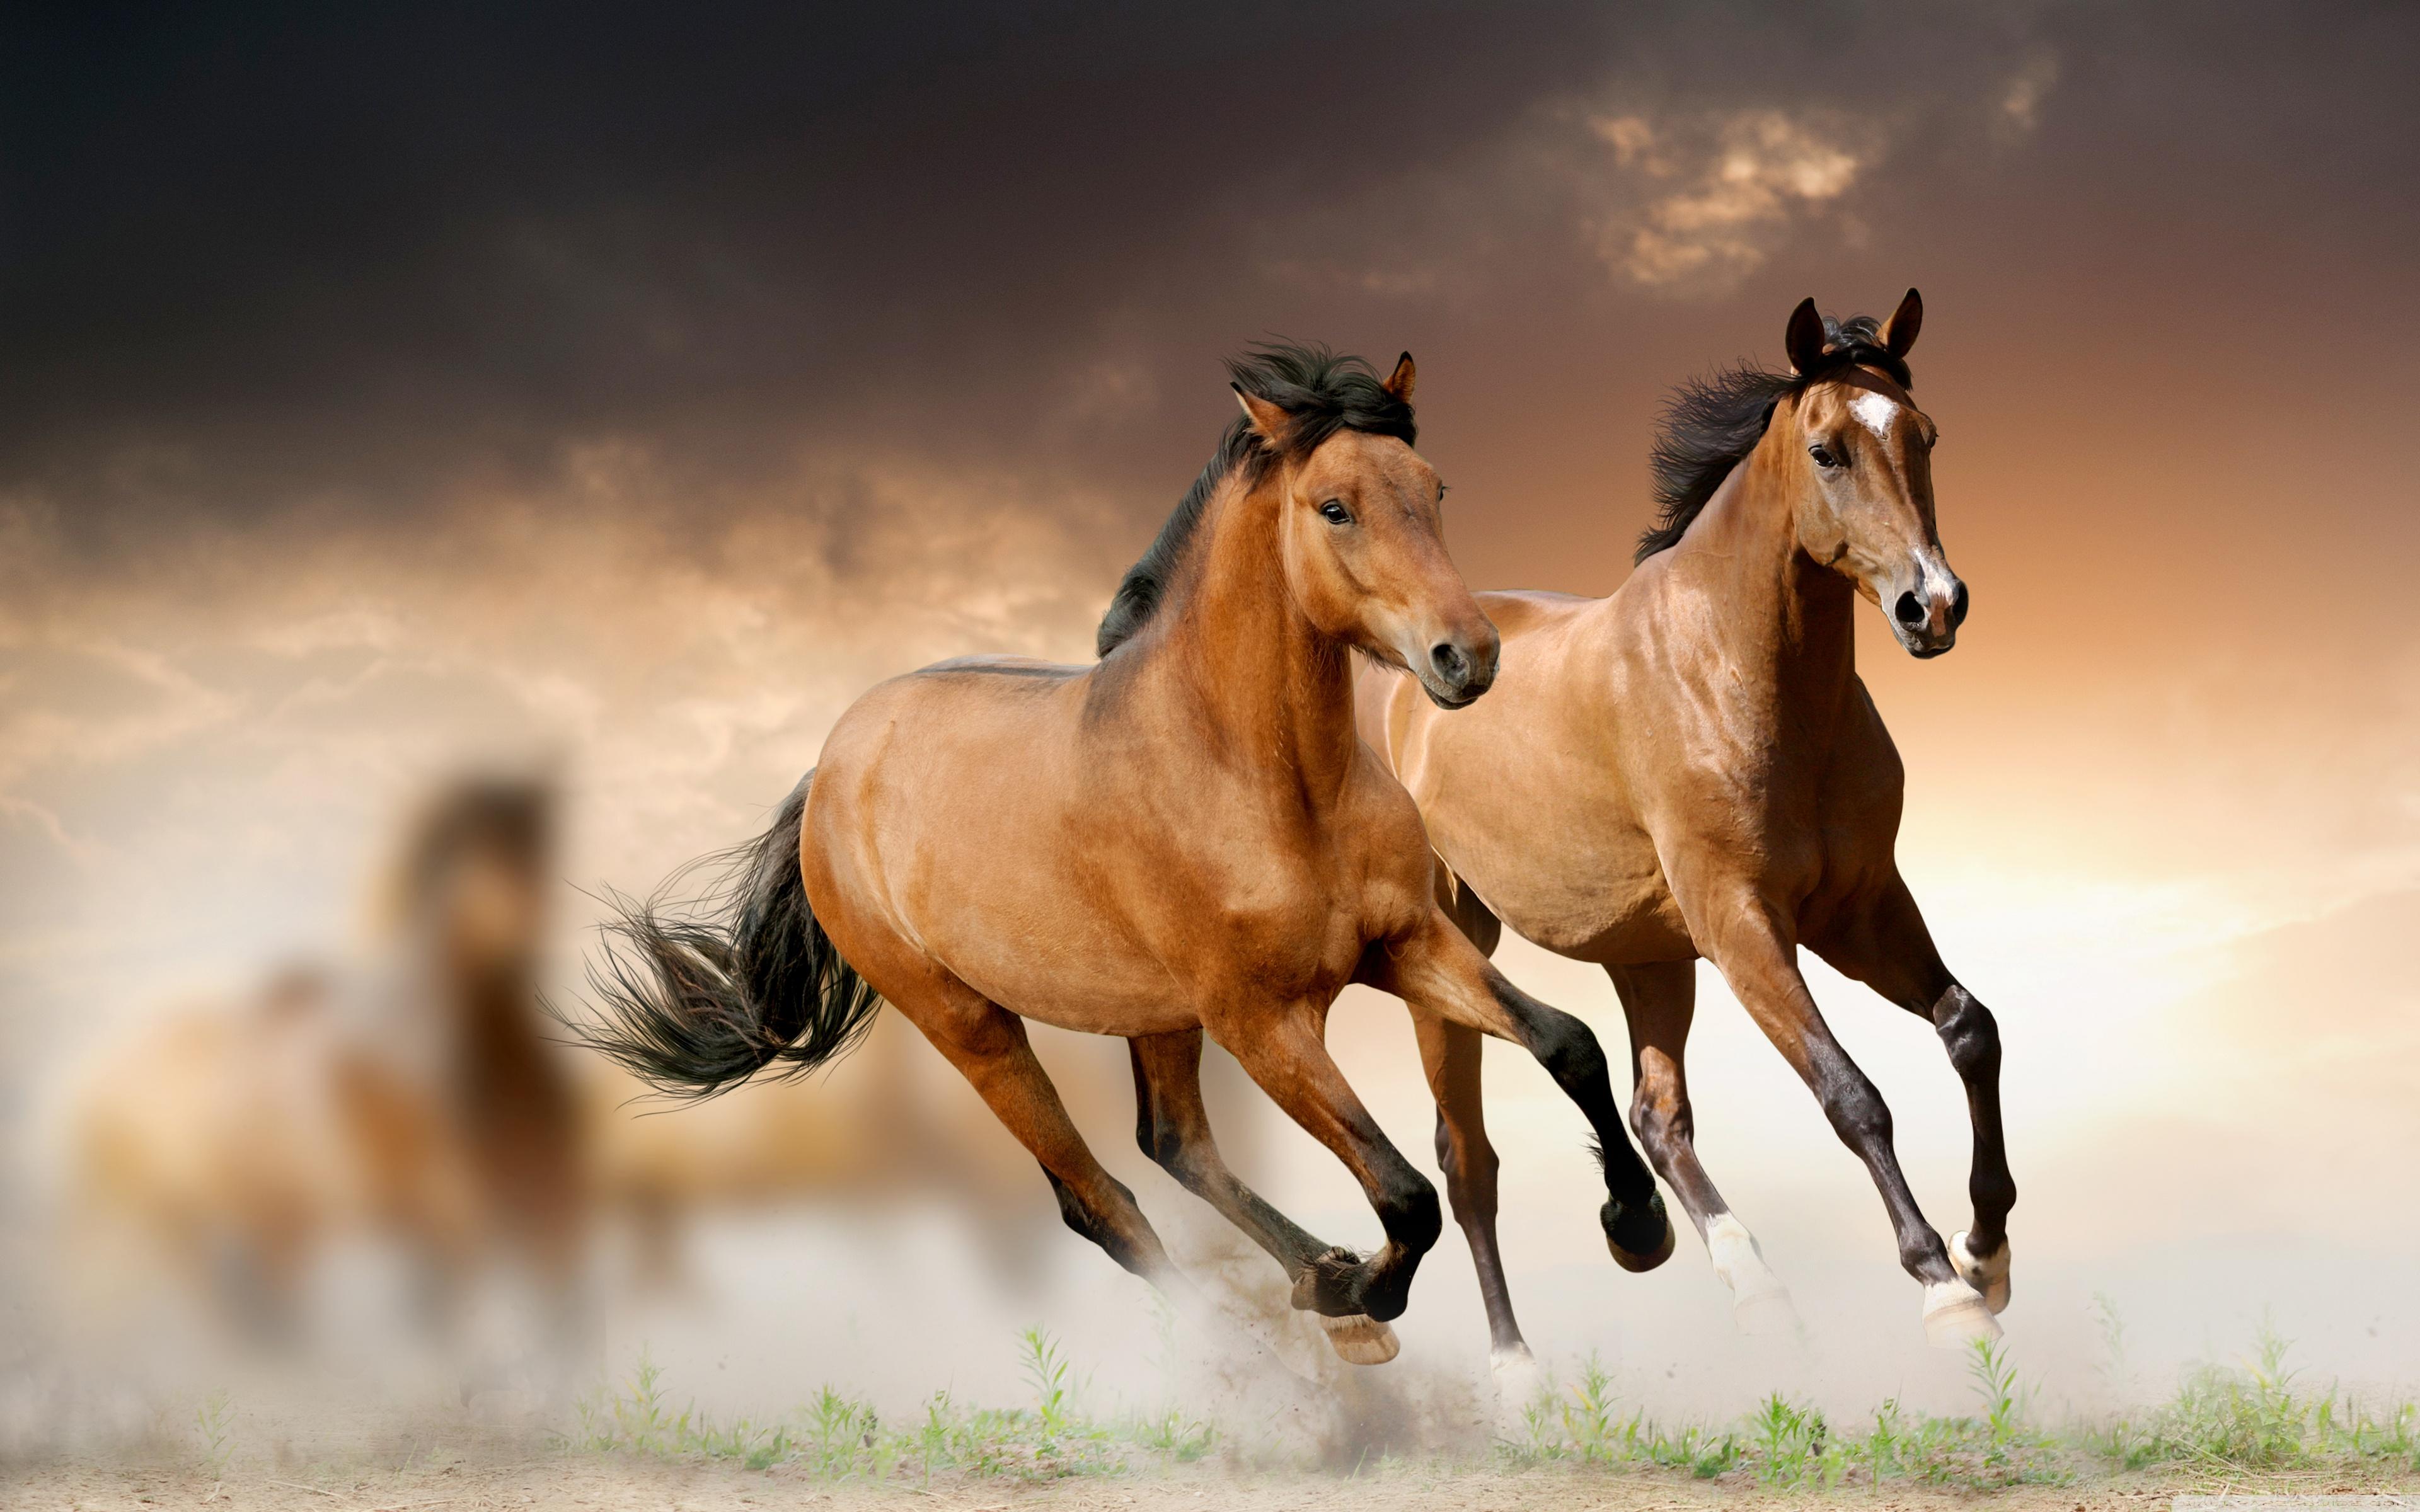 Horses Running 4K HD Desktop Wallpaper for 4K Ultra HD TV 3840x2400